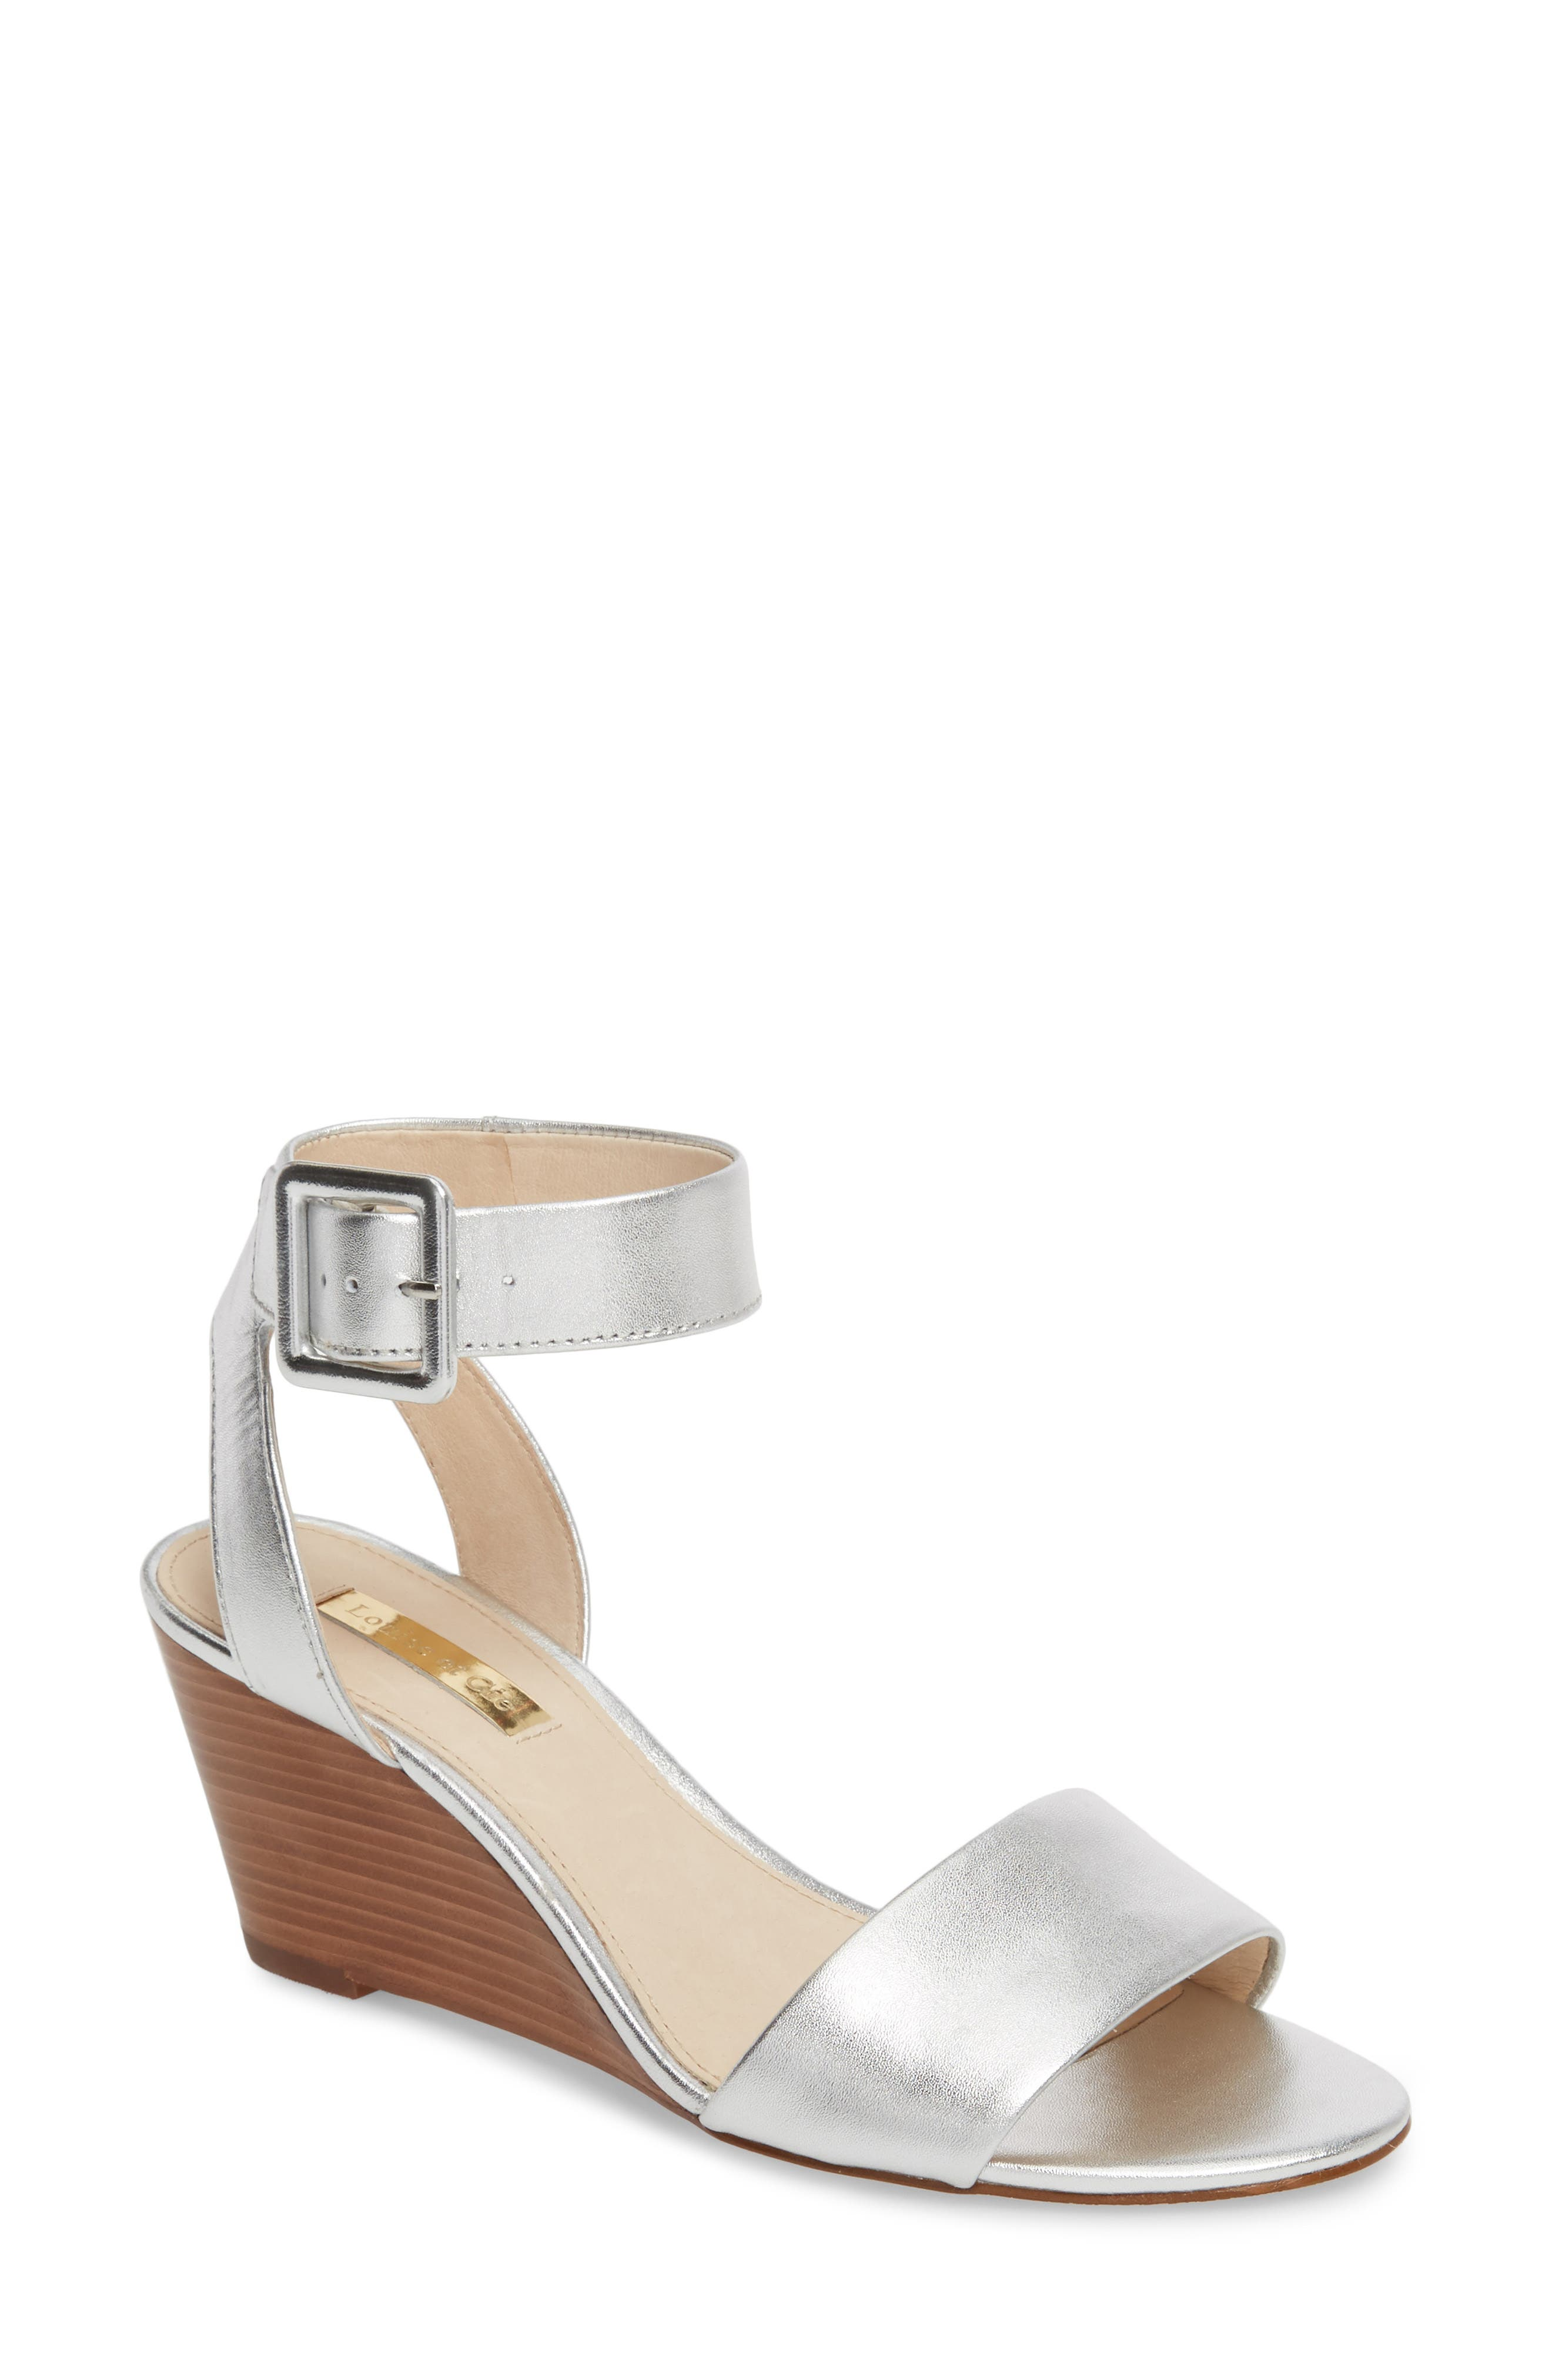 Punya Wedge Sandal,                             Main thumbnail 1, color,                             Metallic Silver Leather